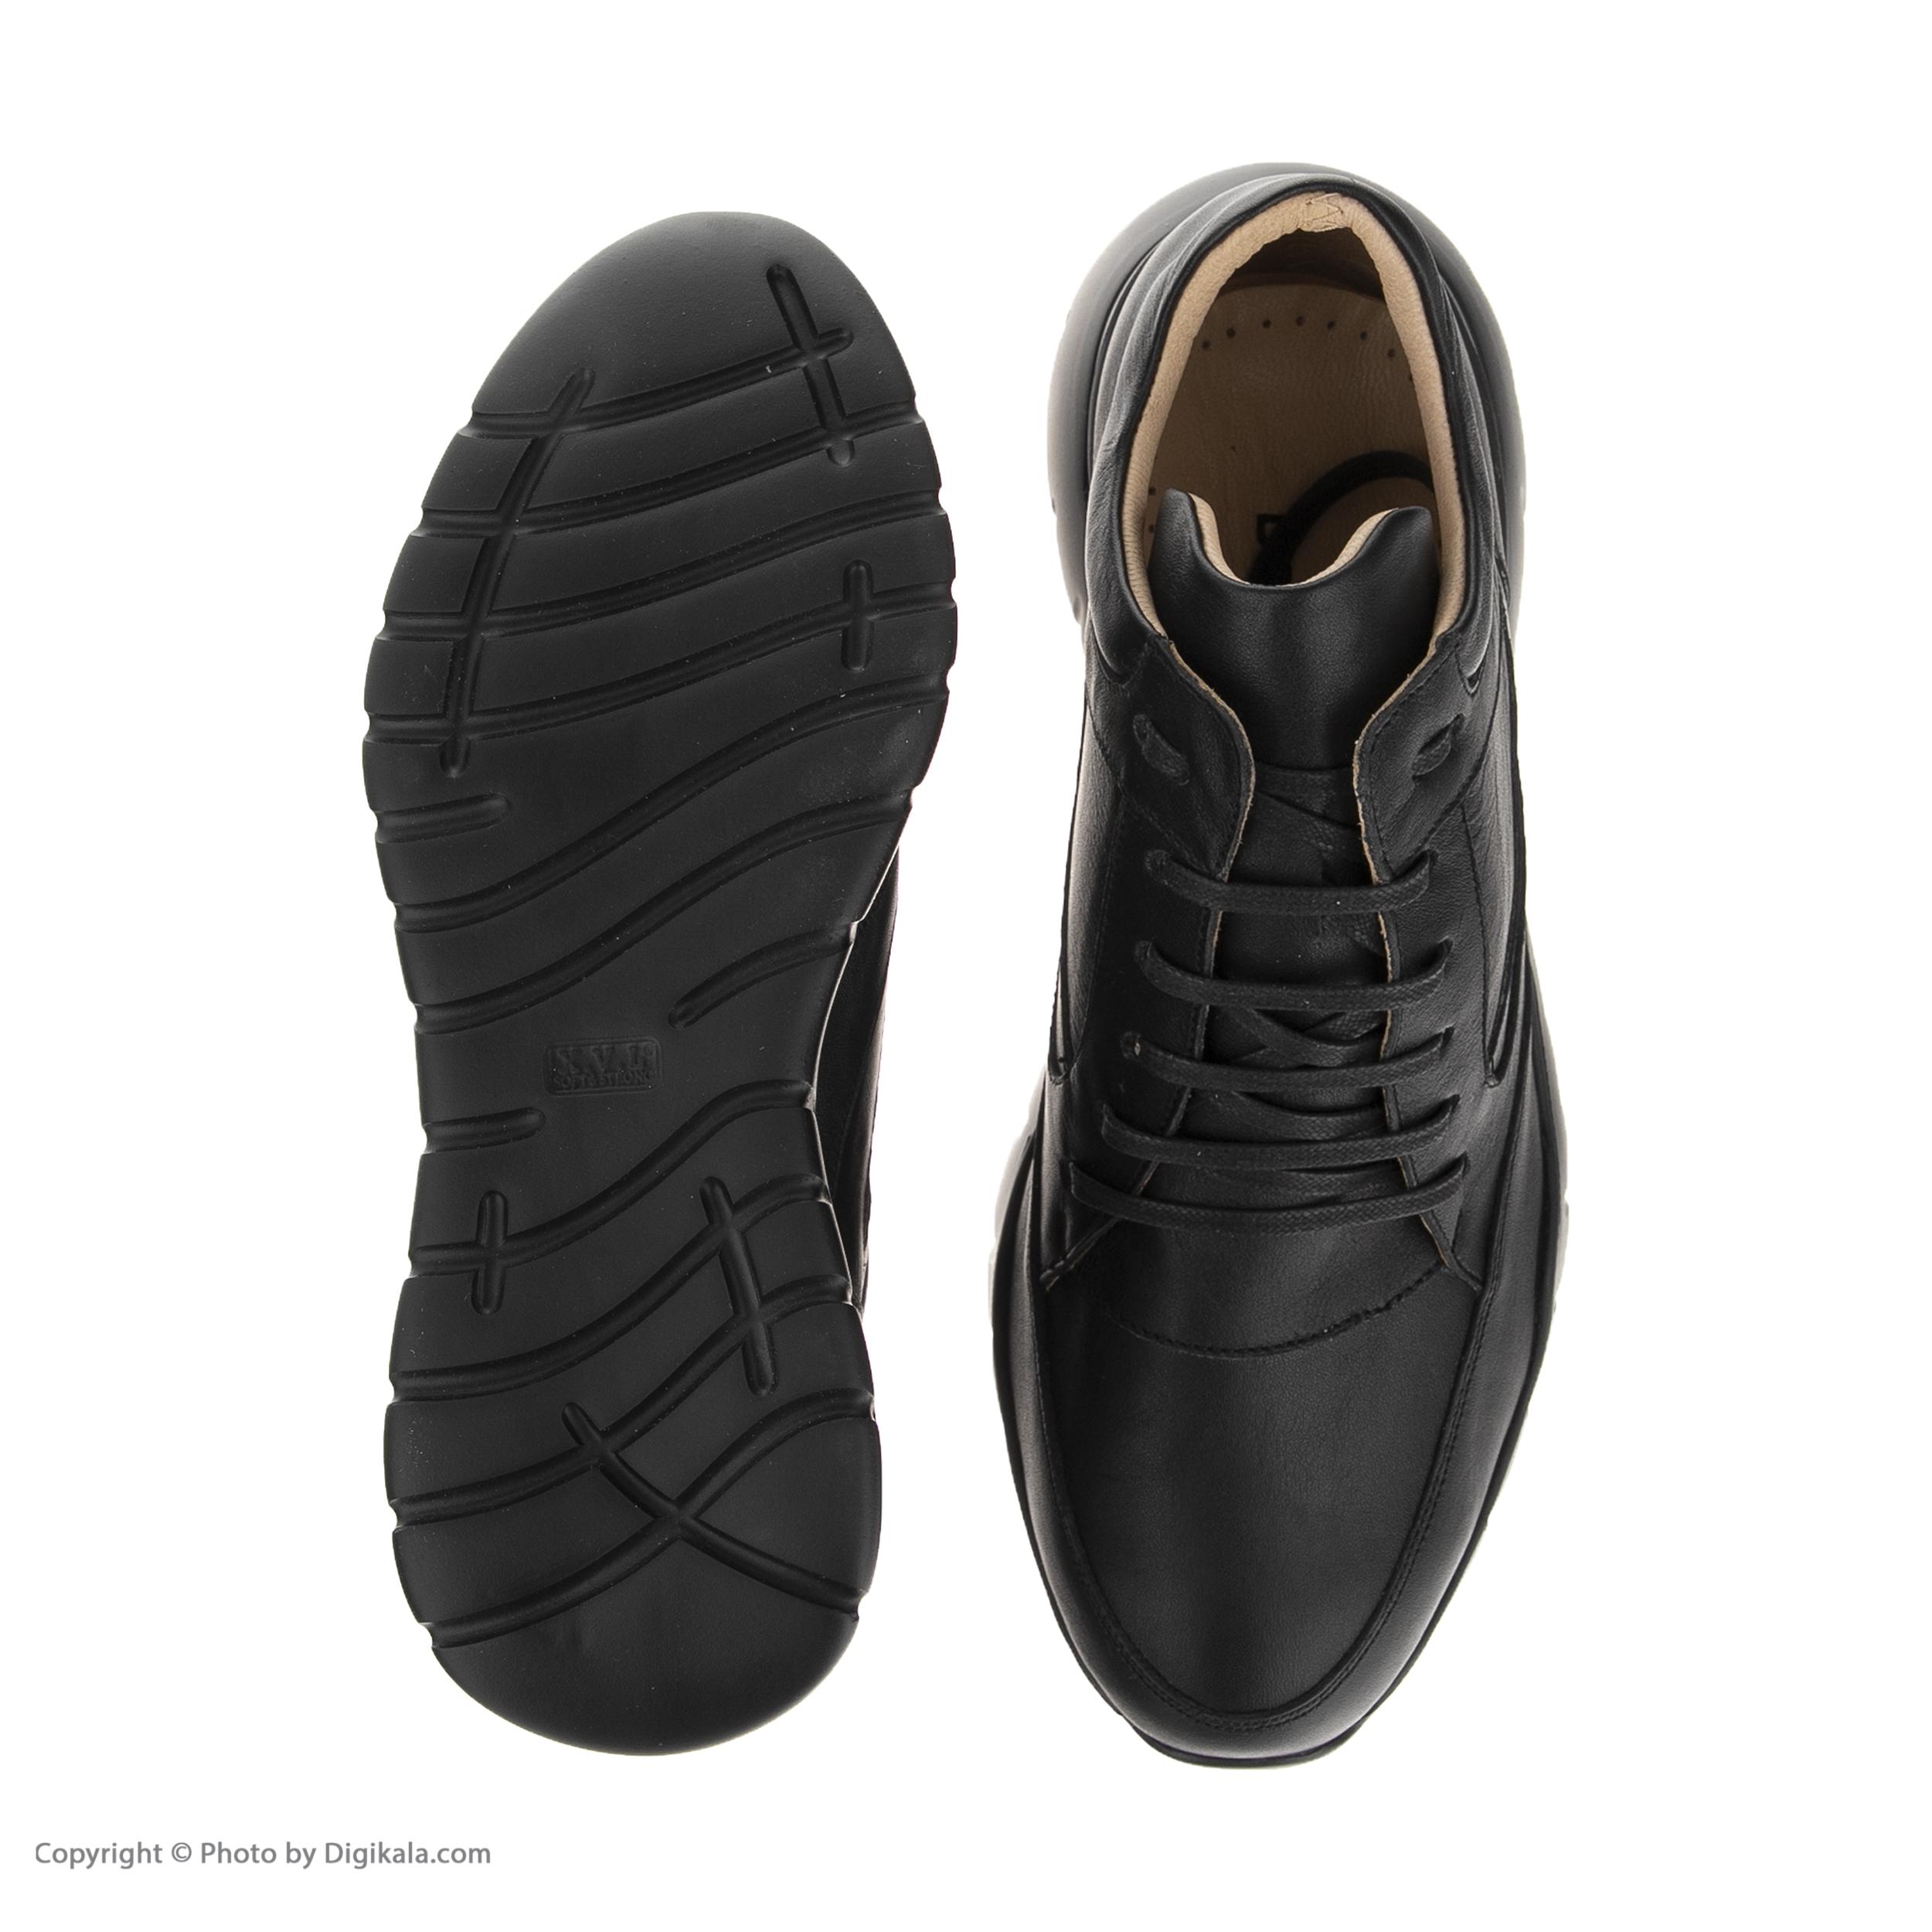 کفش روزمره زنانه برتونیکس مدل 939-27